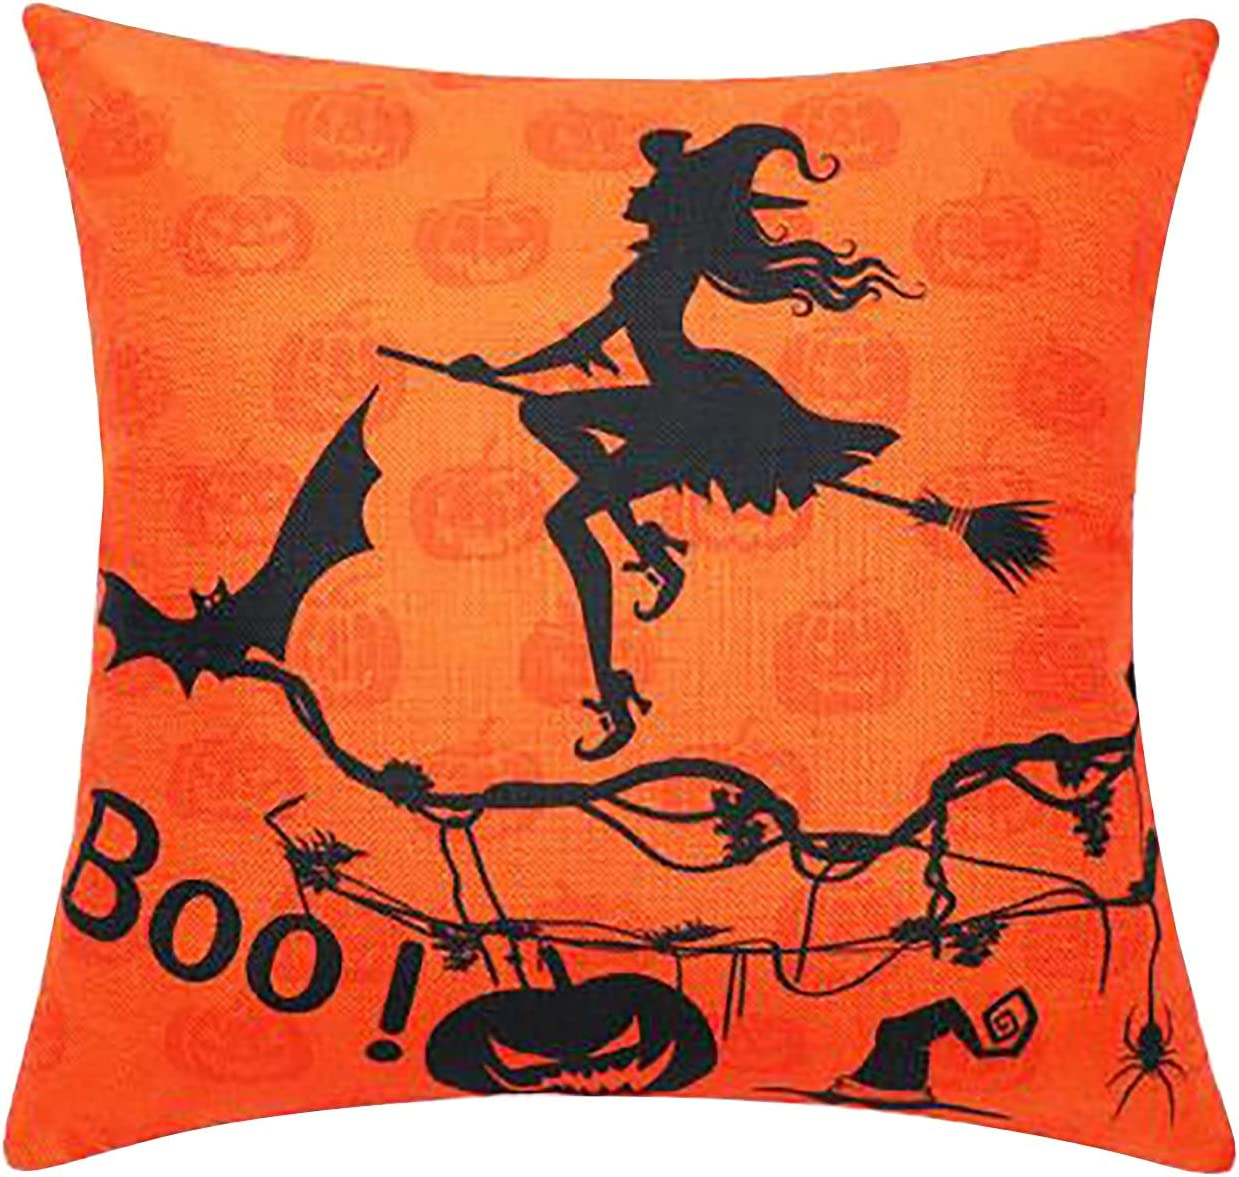 Halloween Decorations El Paso Mall Imitation Linen Topics on TV Printing Digital Pillowca